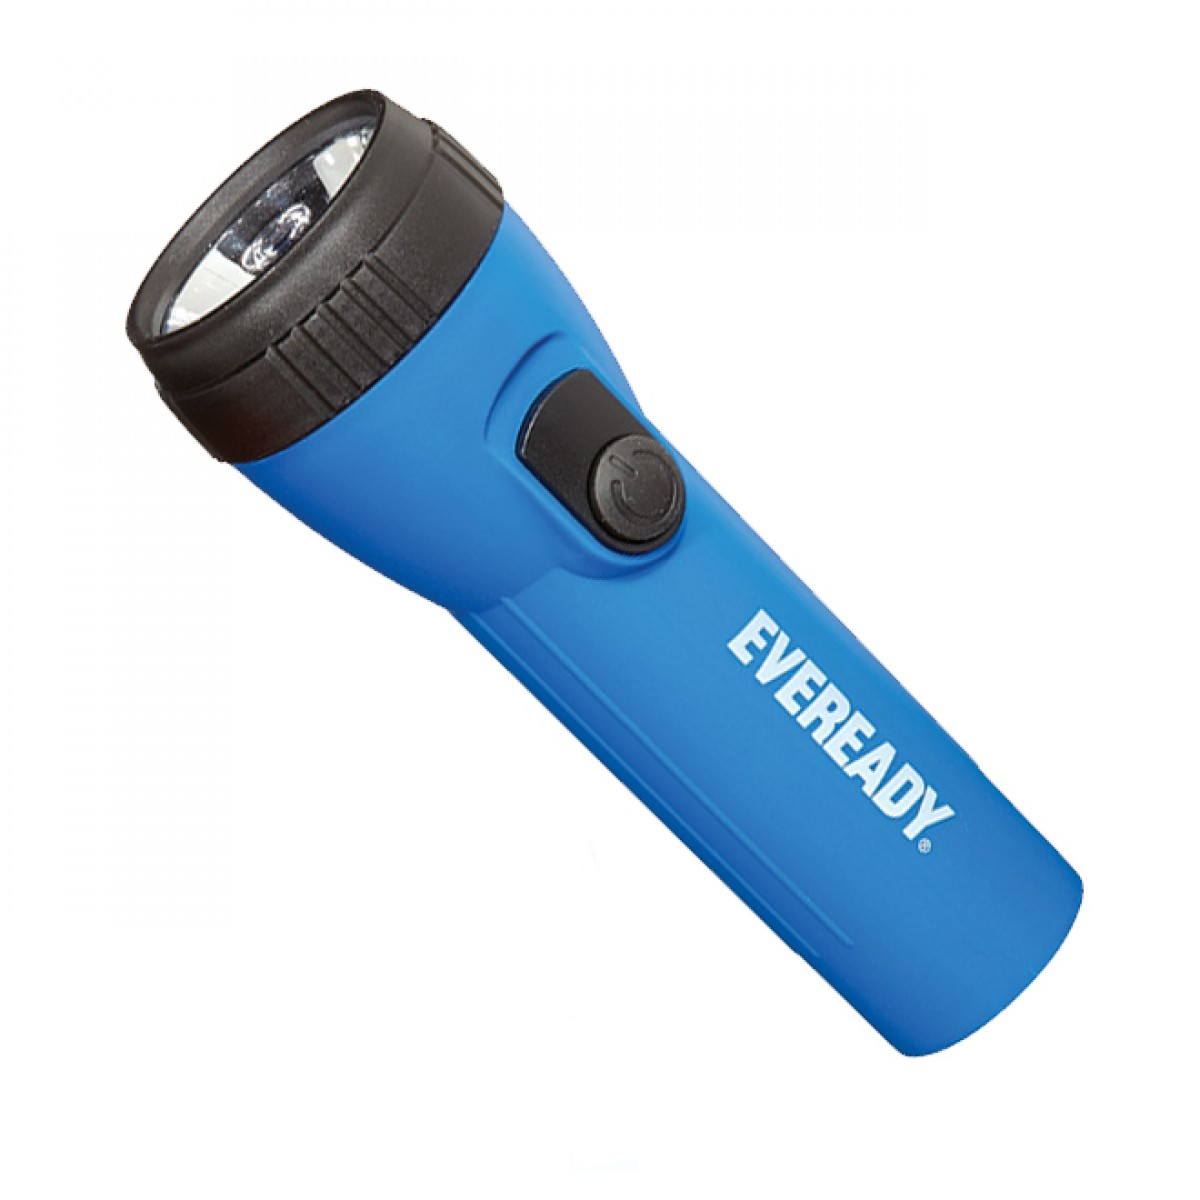 Eveready 2D LED Flashlight LC1L2D-BLUE